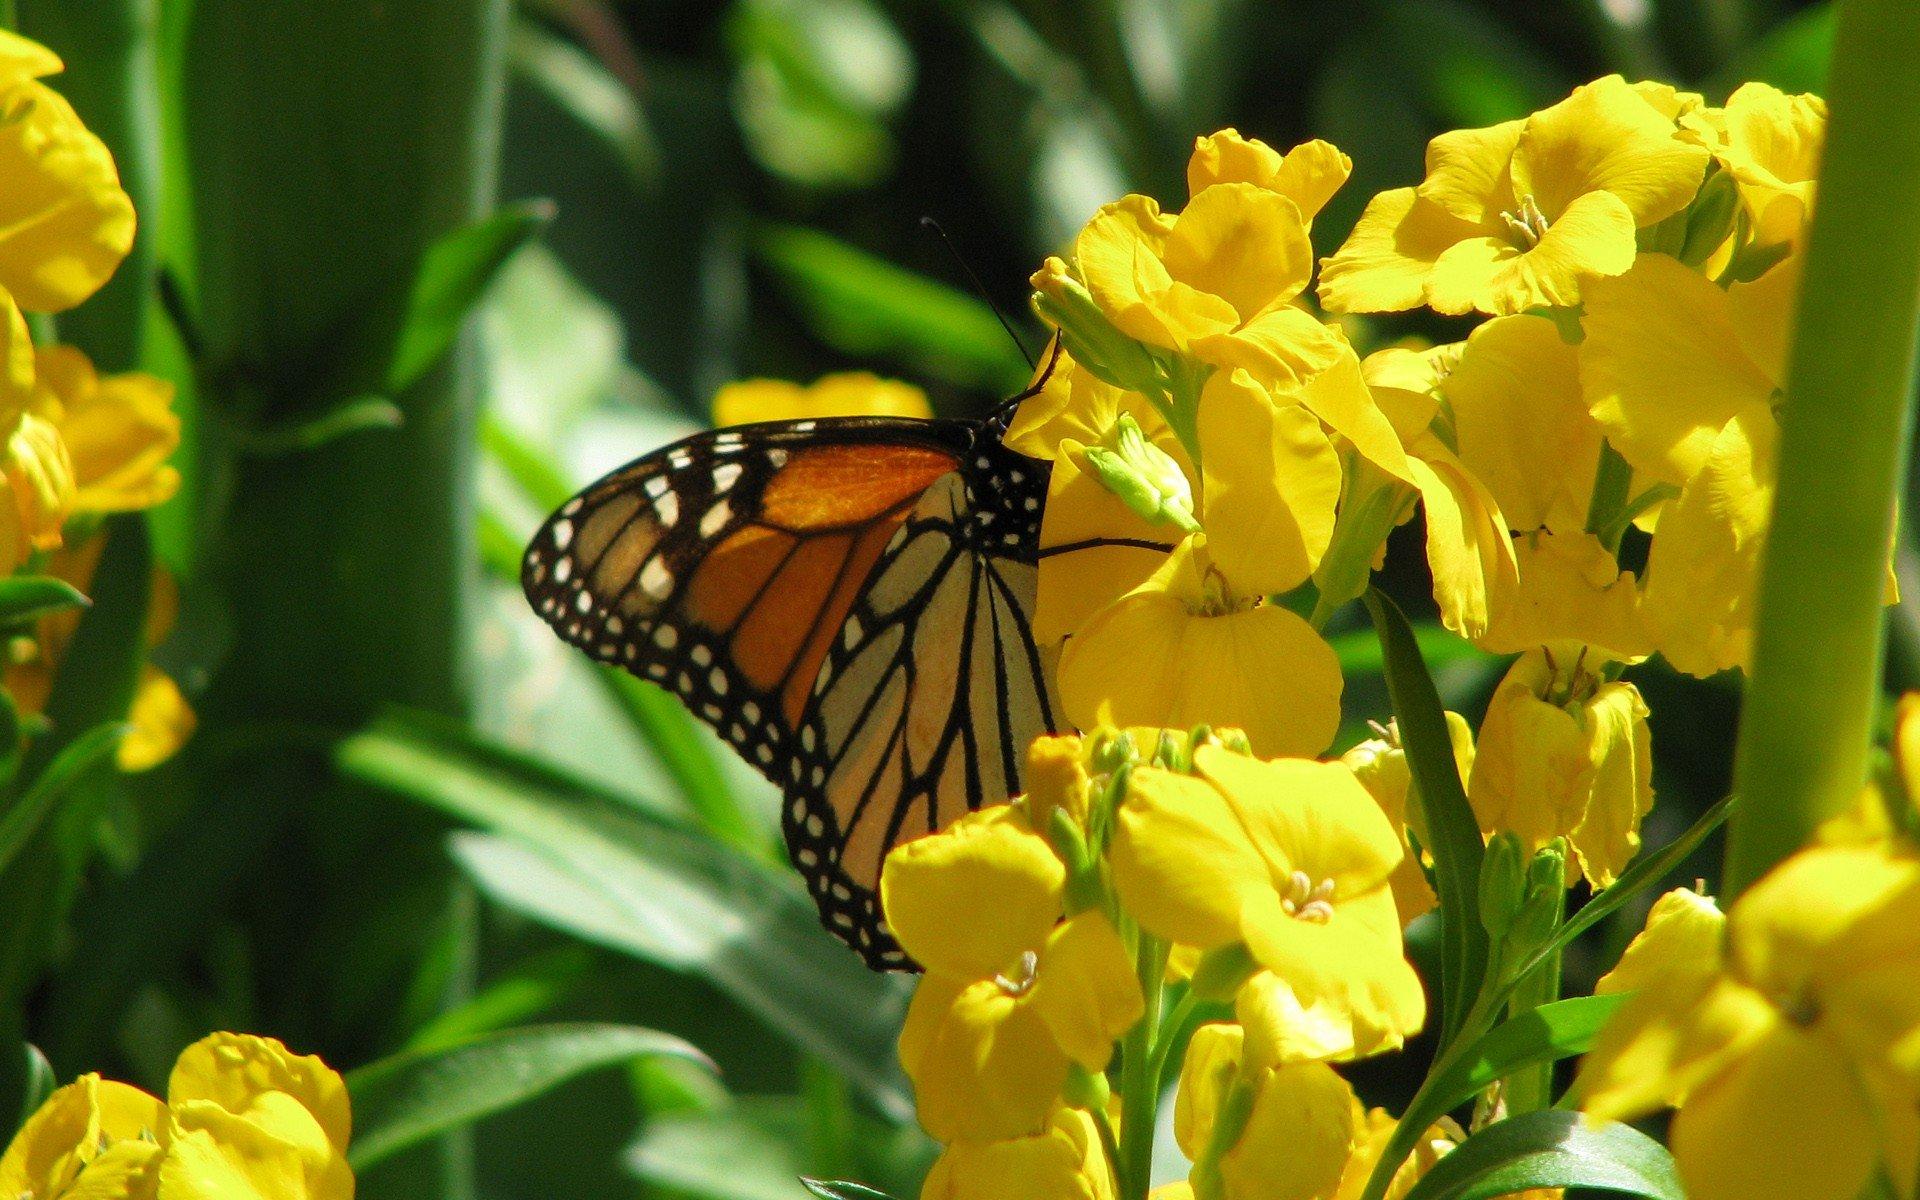 Spring Butterfly Wallpaper - WallpaperSafari